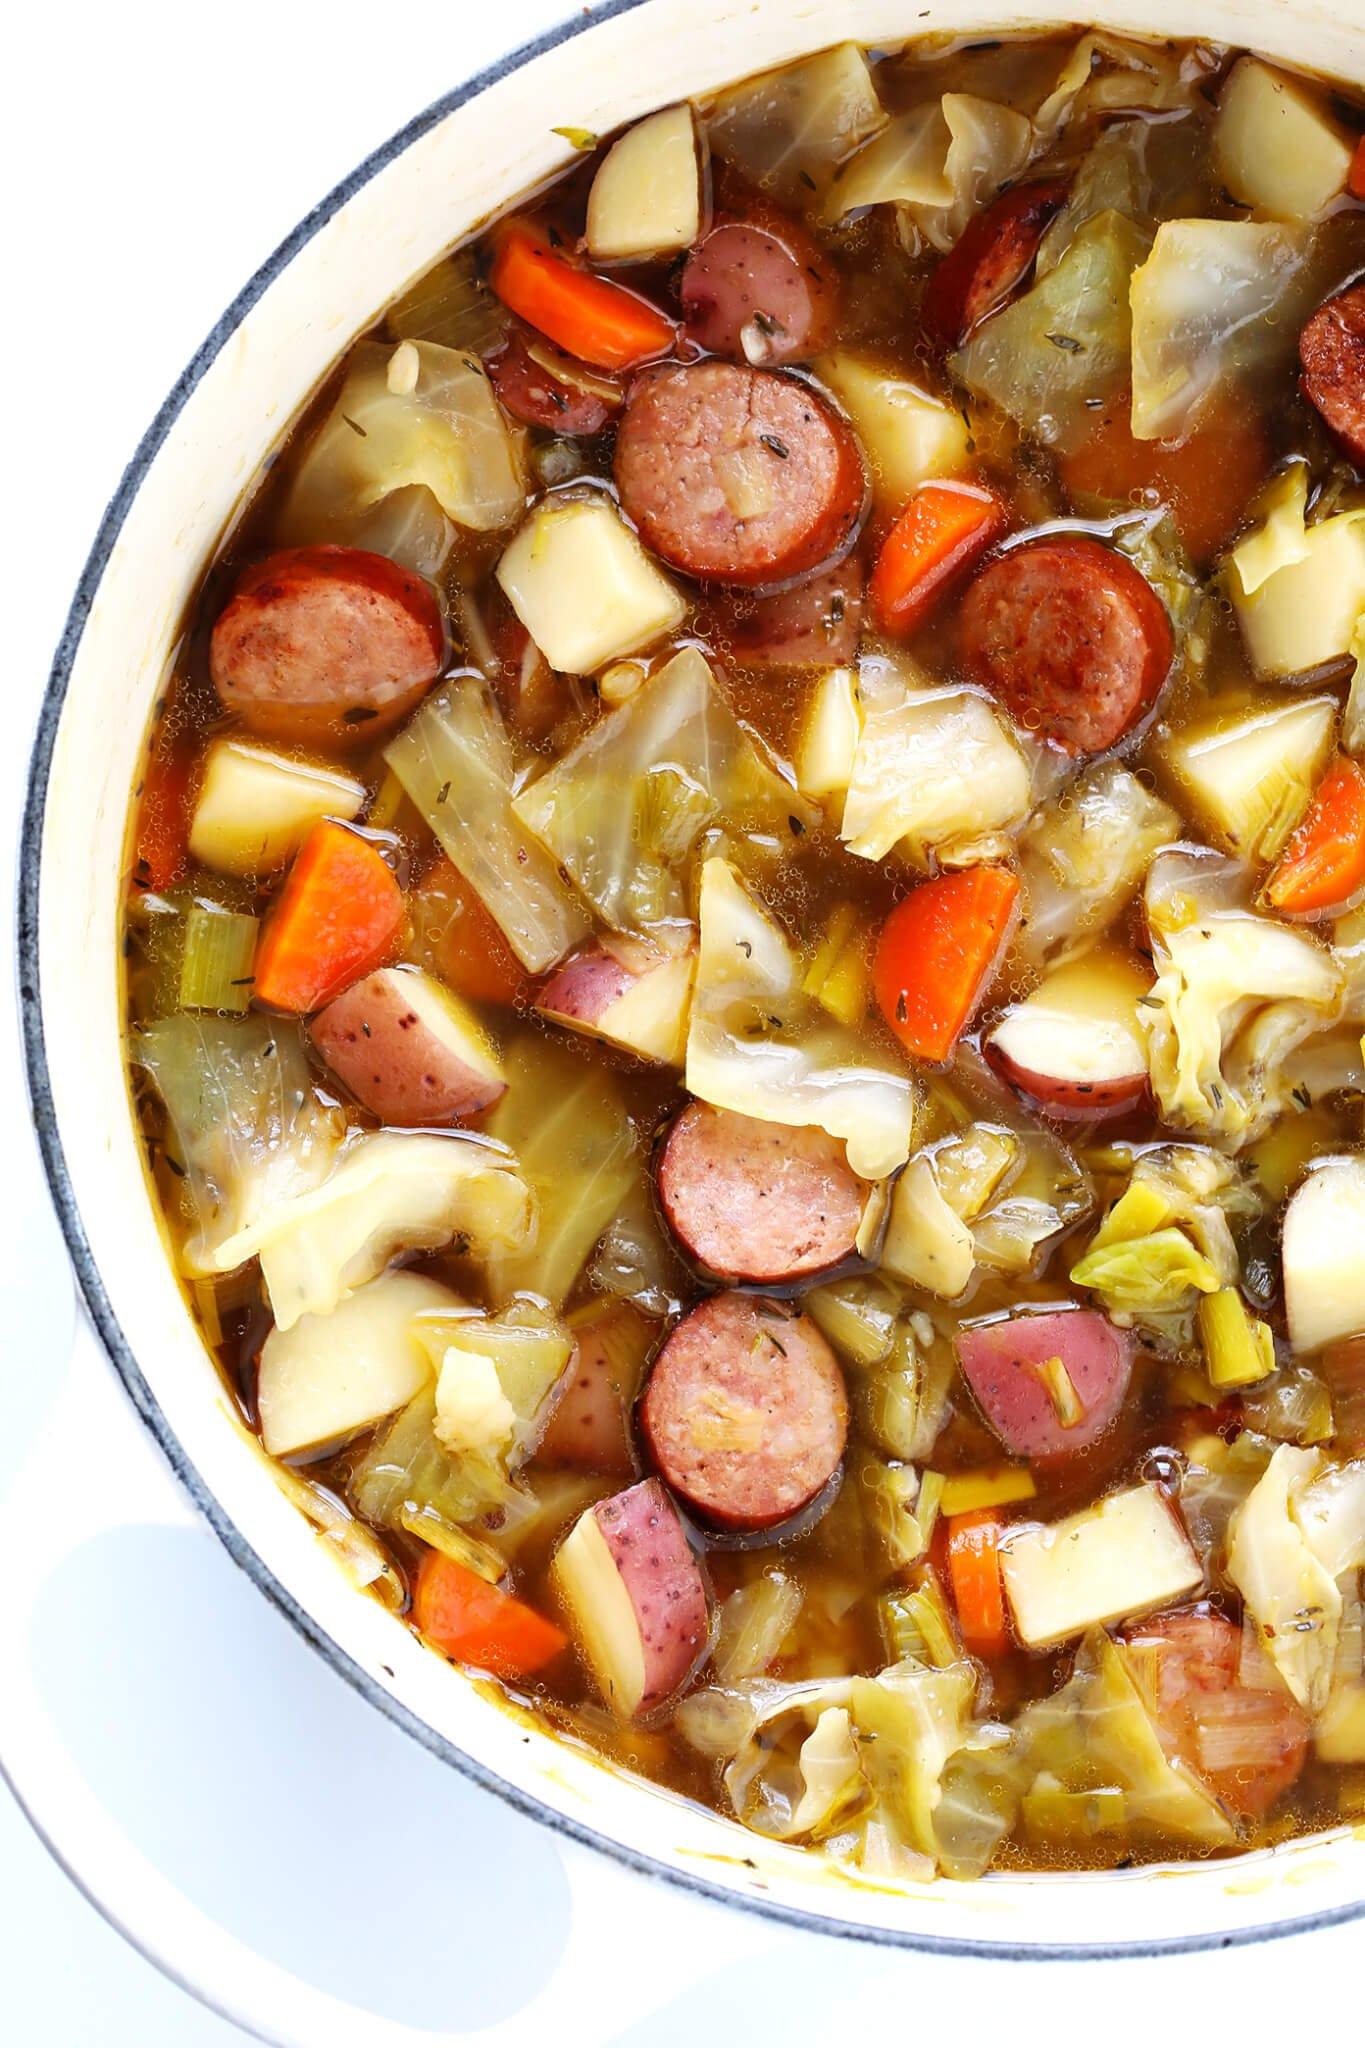 How to Make Kielbasa and Cabbage Soup